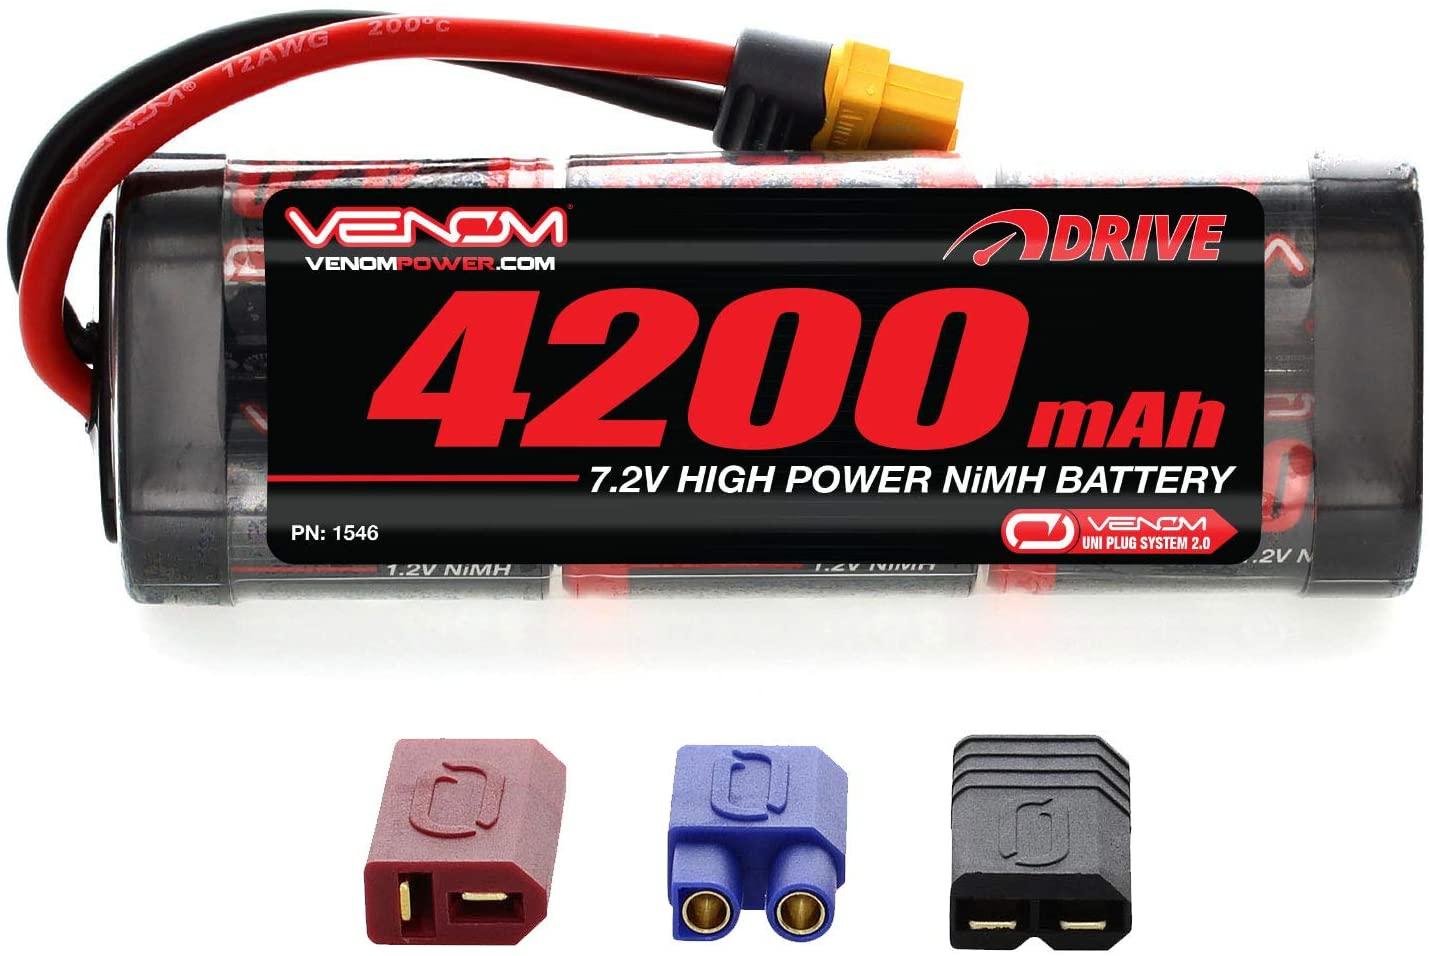 Venom 7.2v 4200mAh 6-Cell NiMH Battery with Universal Plug System